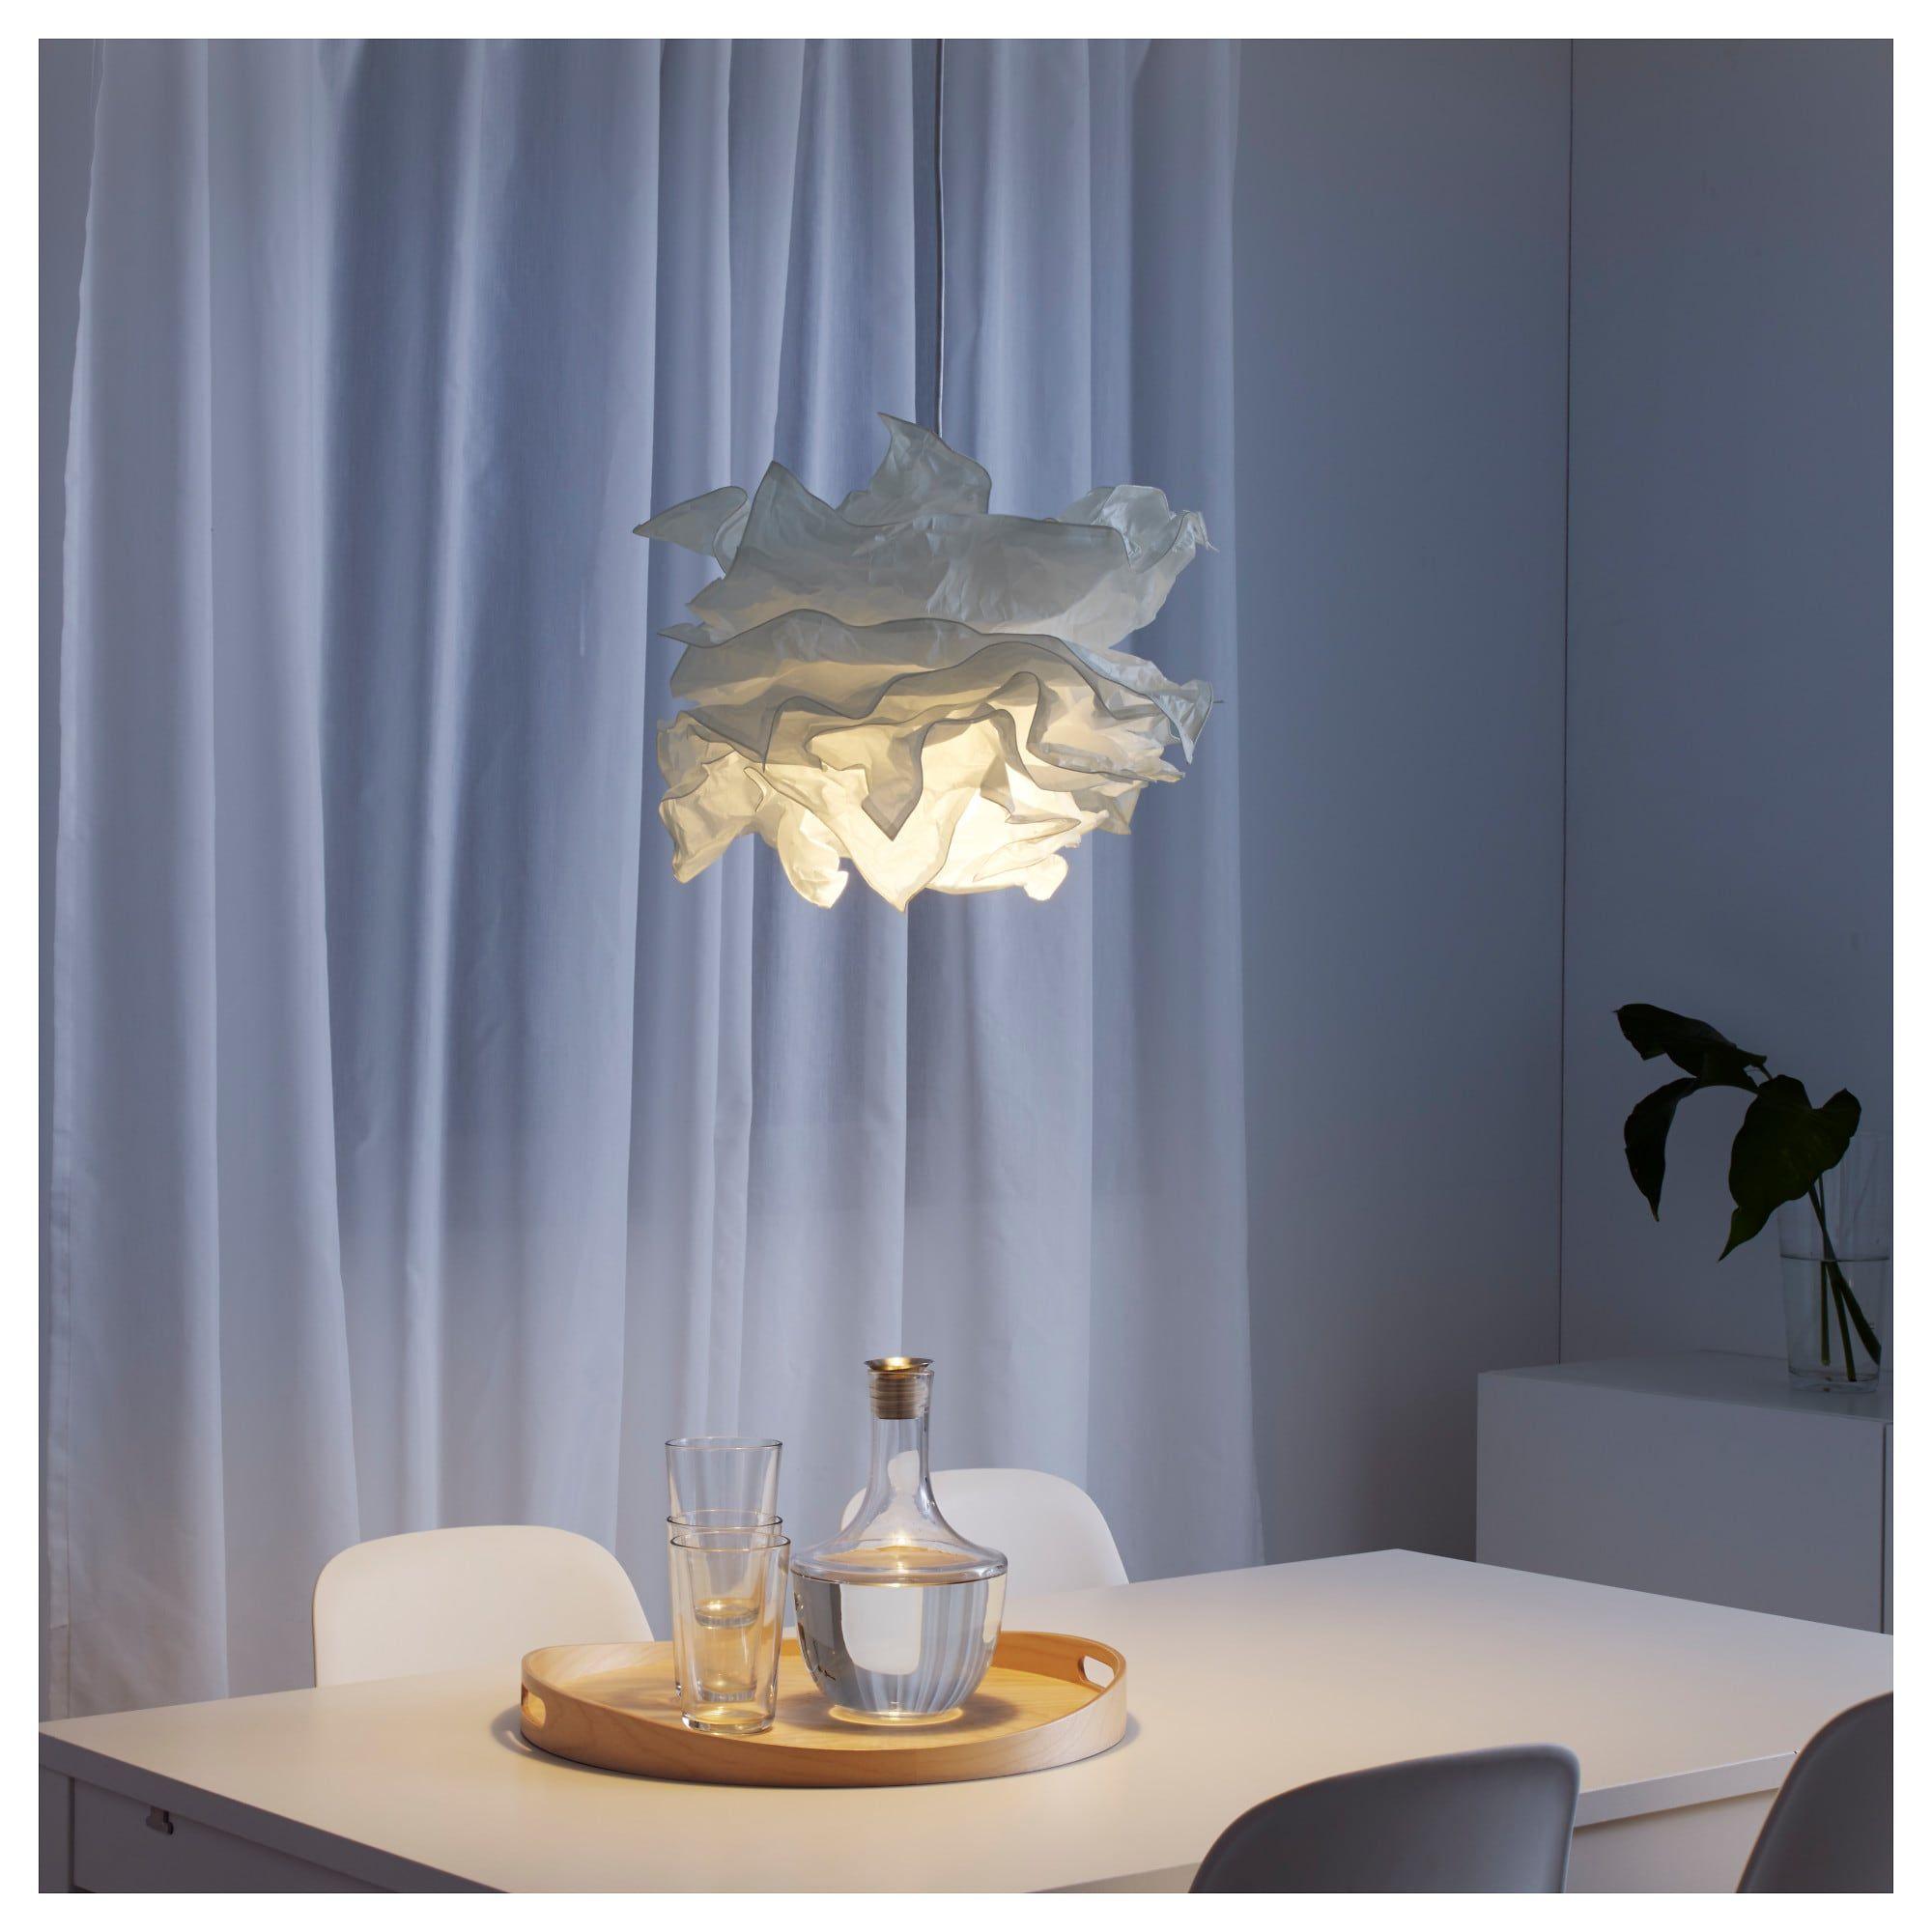 Australia Pendant lamp shade, White pendant lamp